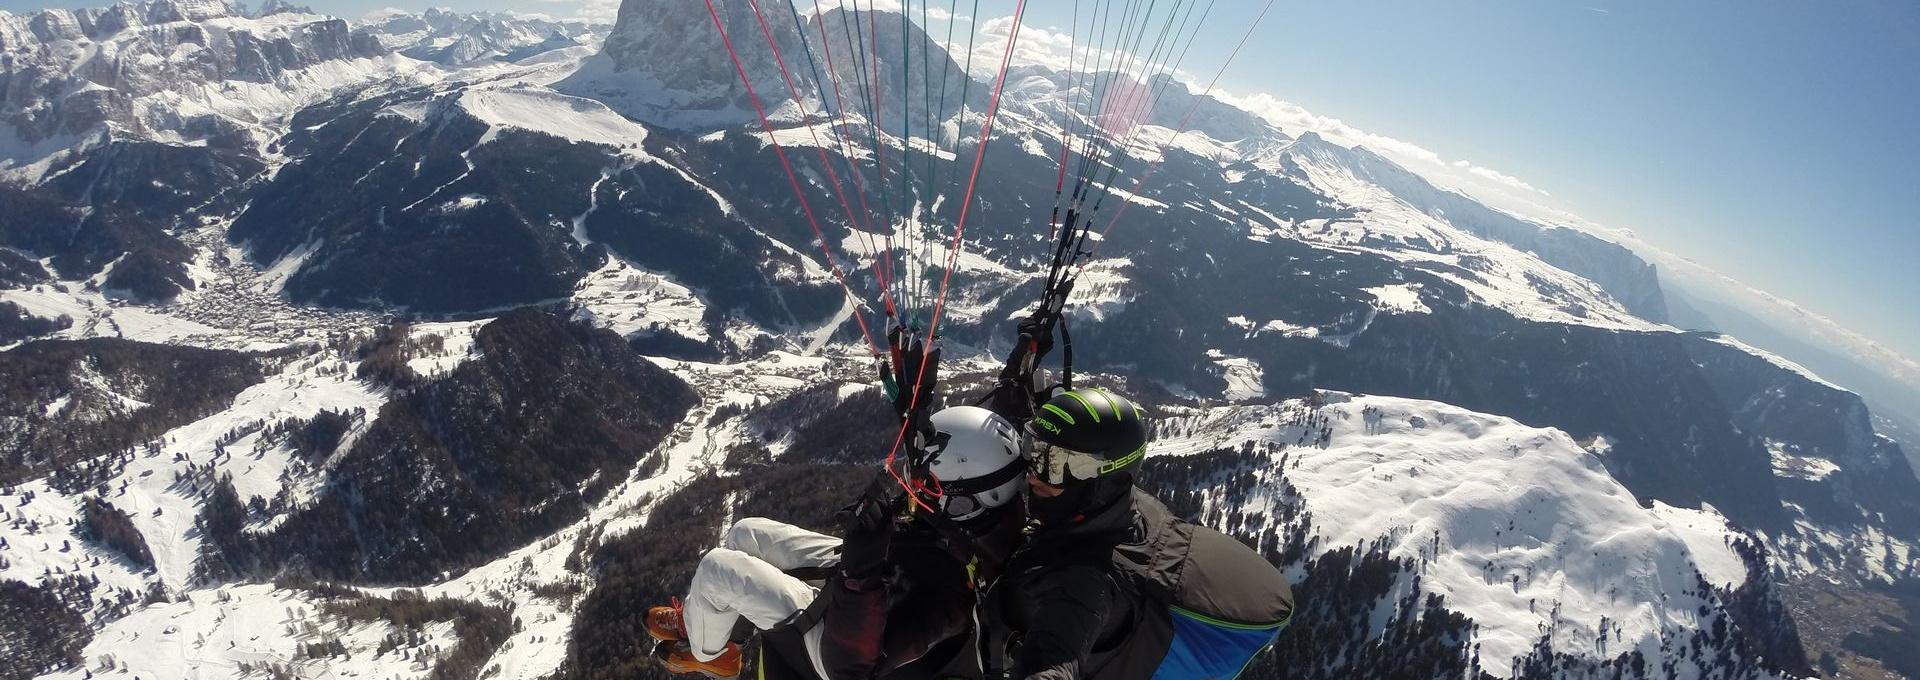 Alpen - Gleitschirmfliegen Gröden